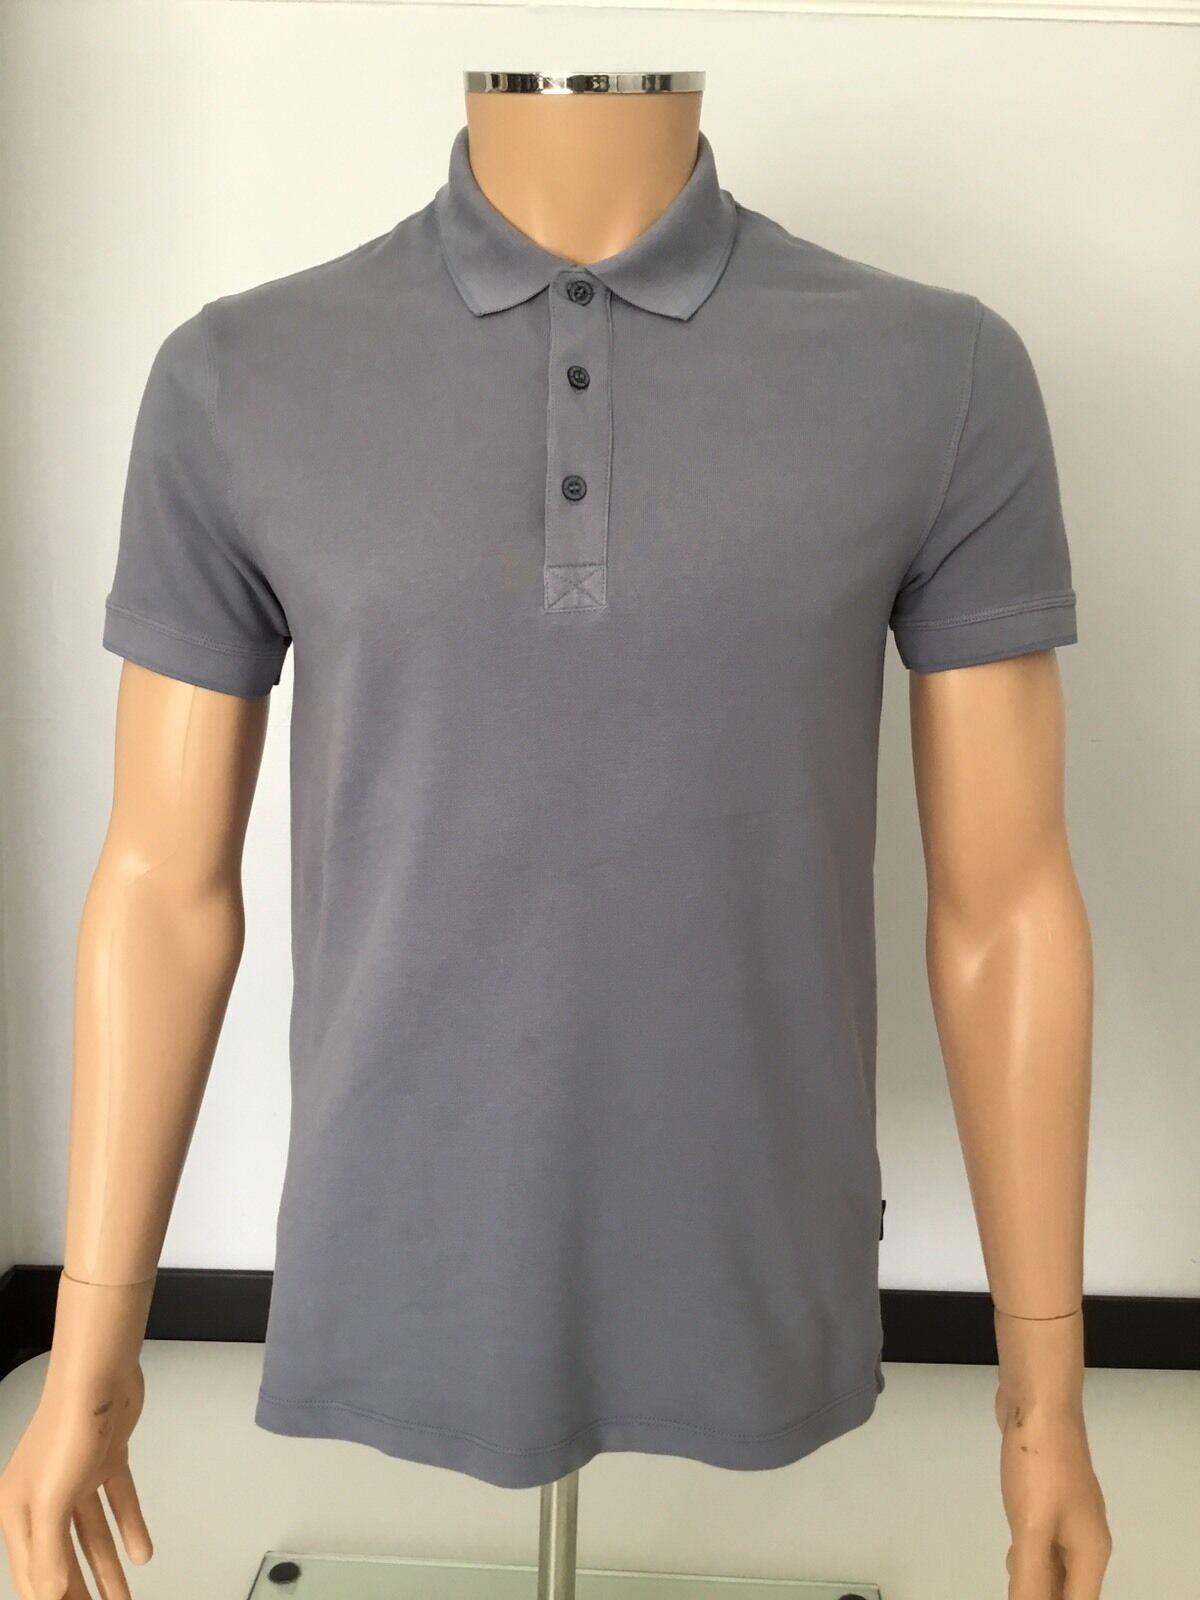 6de265ce Hugo Boss Men's Polo Slim Fit T Shirt, Size Small, Grey, Vgc ...